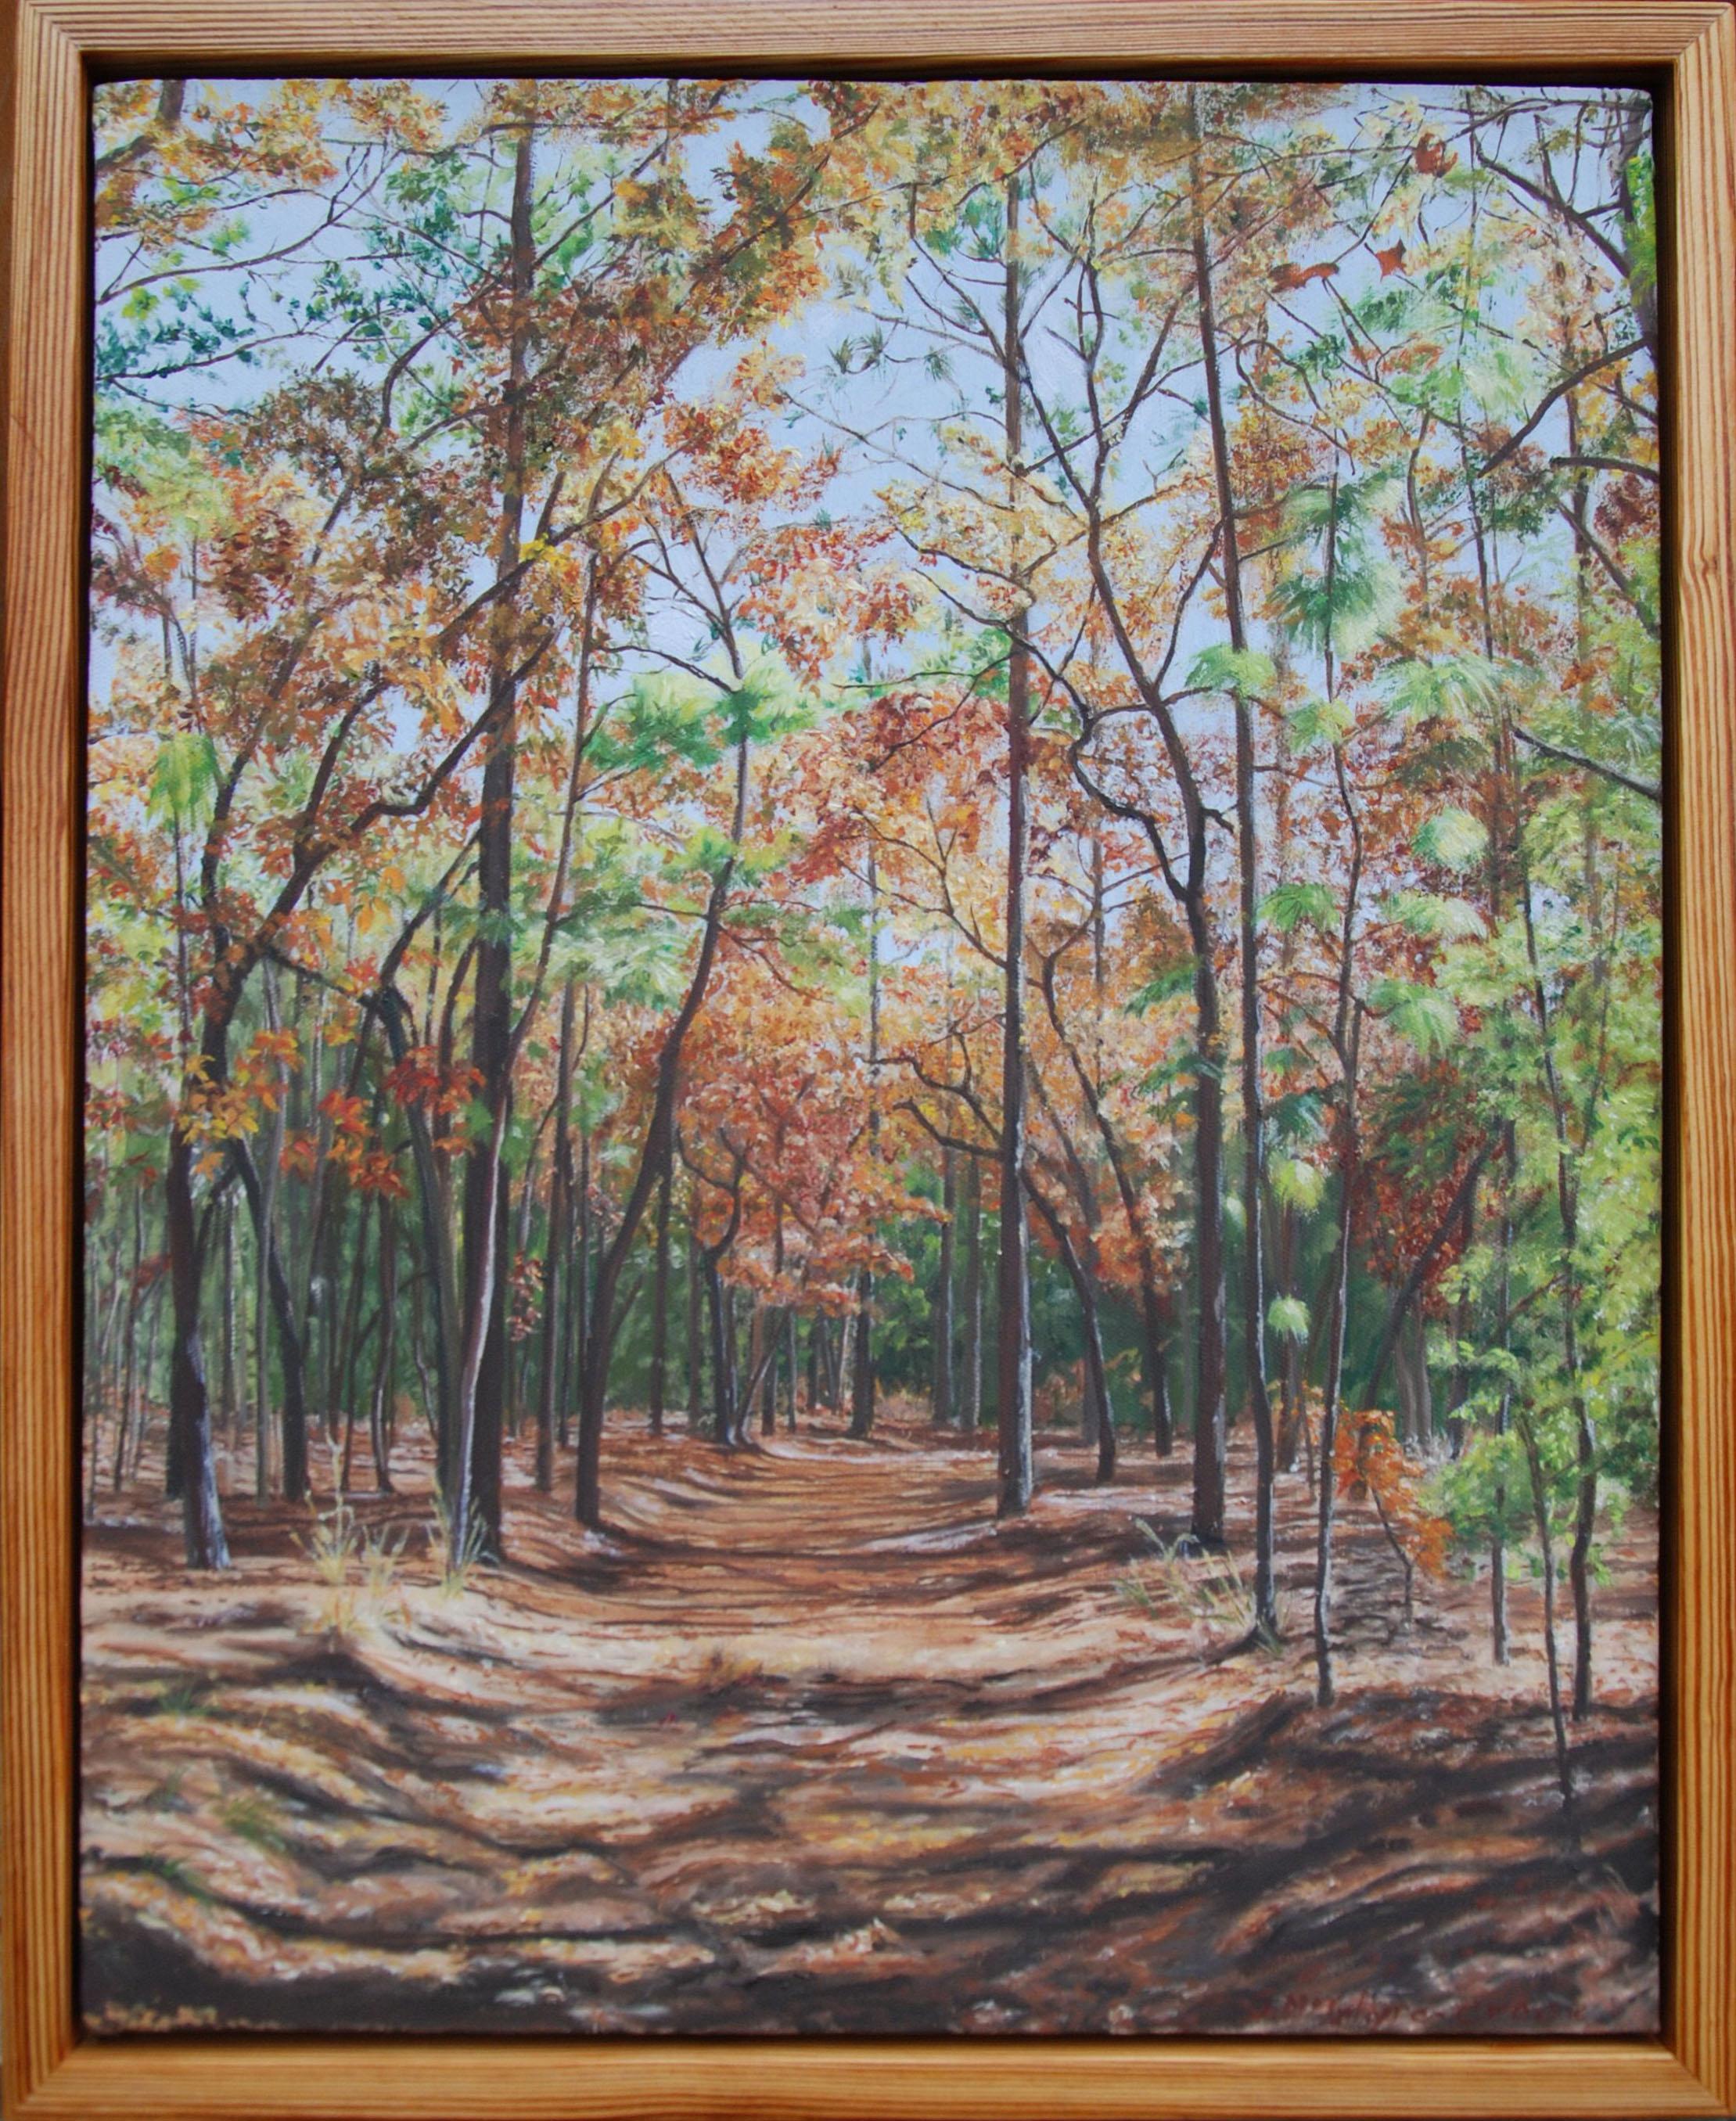 "An Autumn Walk Through San Felasco Hammock #6 of 6; Cathedral nave.  oil on canvas; 22 x 18""; 2010; sold"